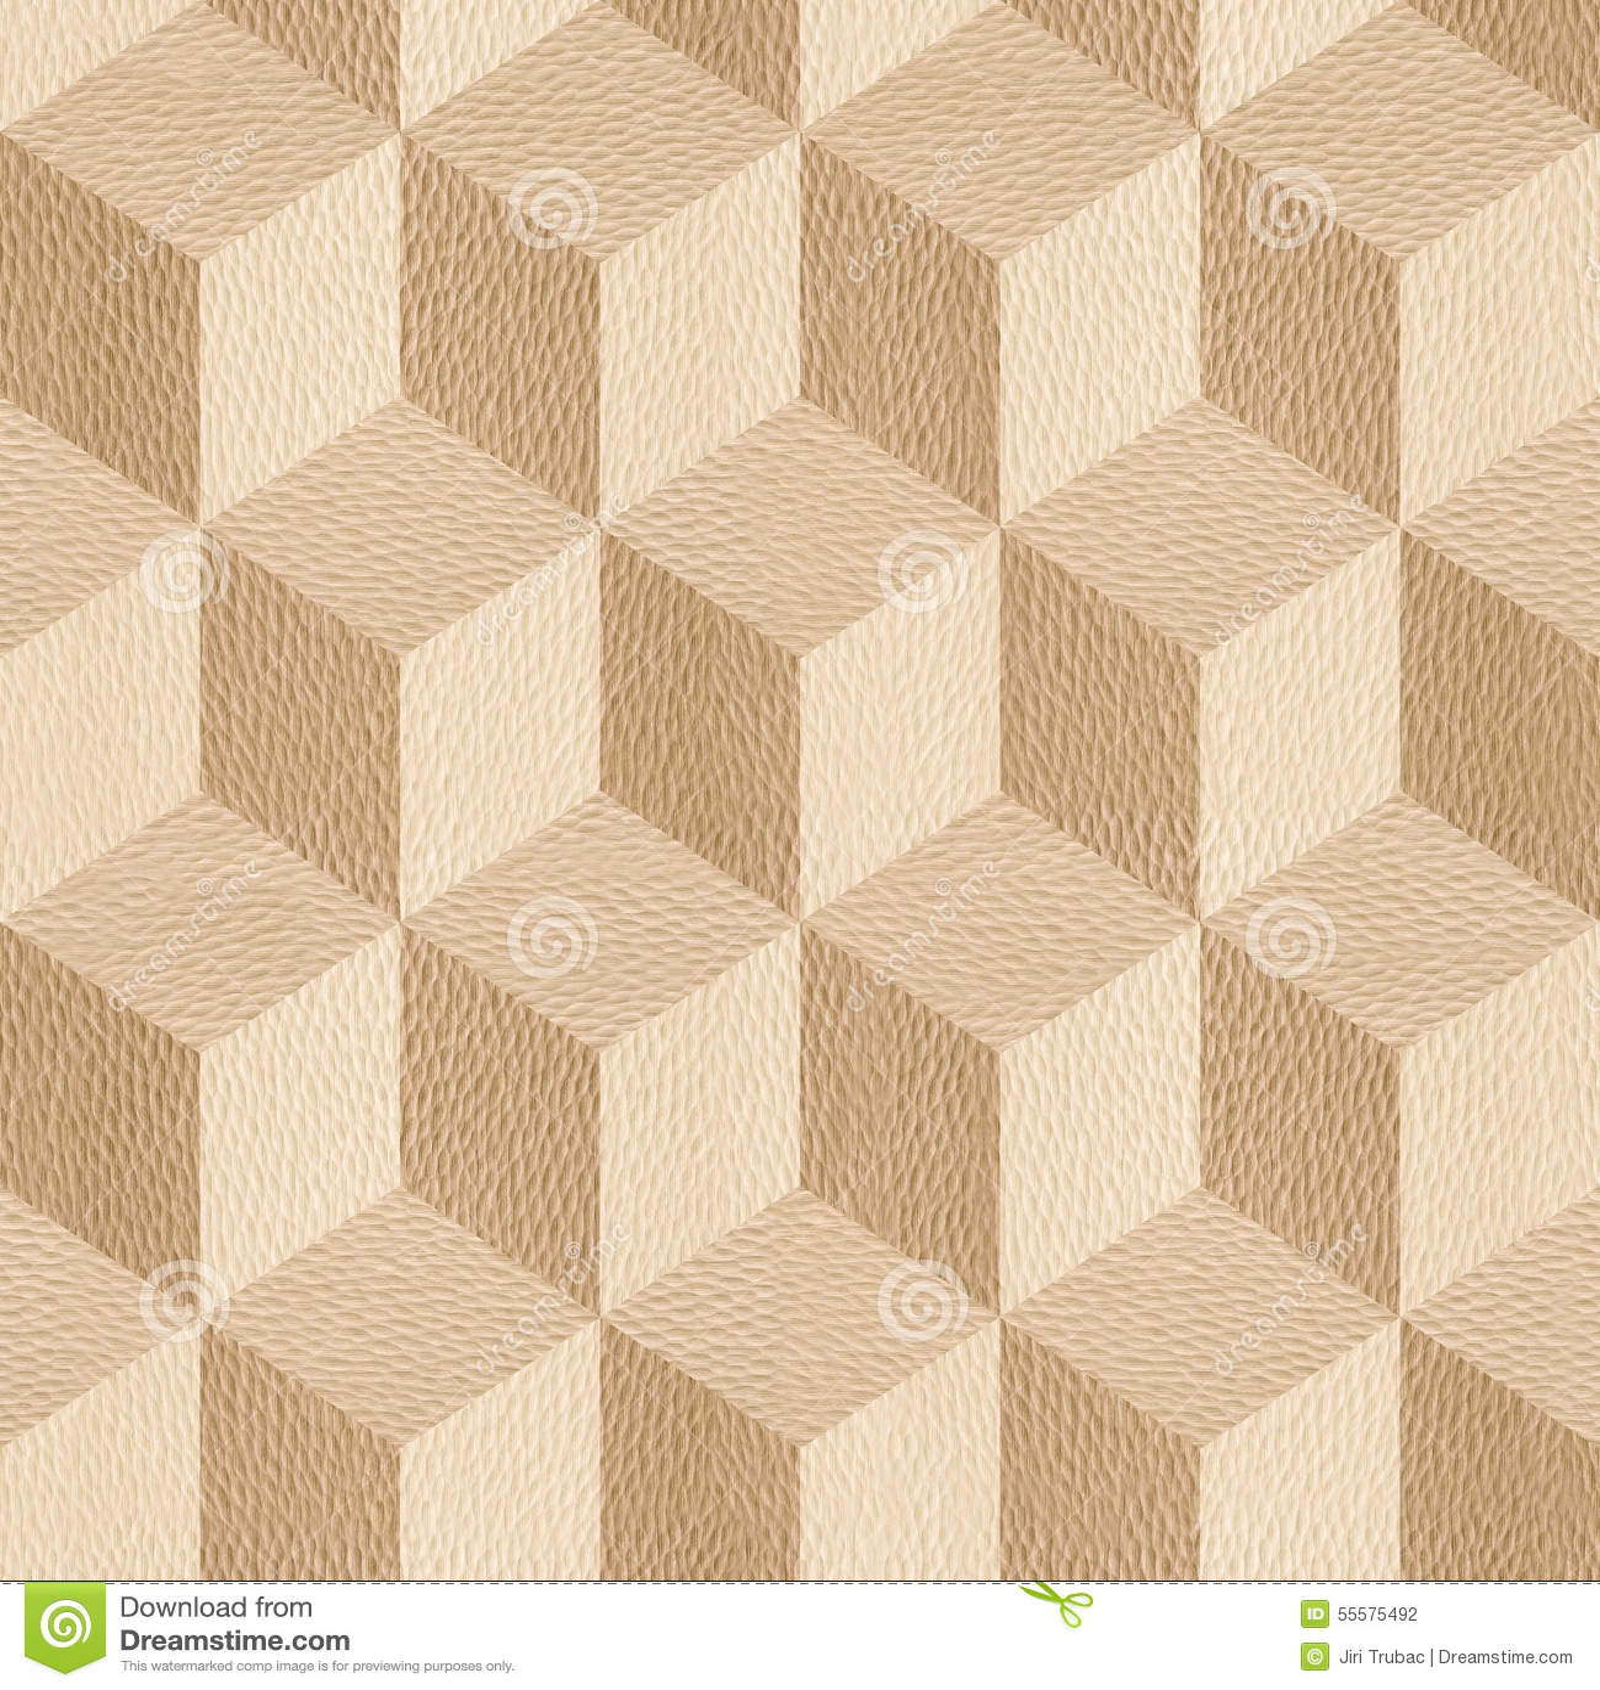 Houten parketblokken - naadloze achtergrond - Wit Eiken hout